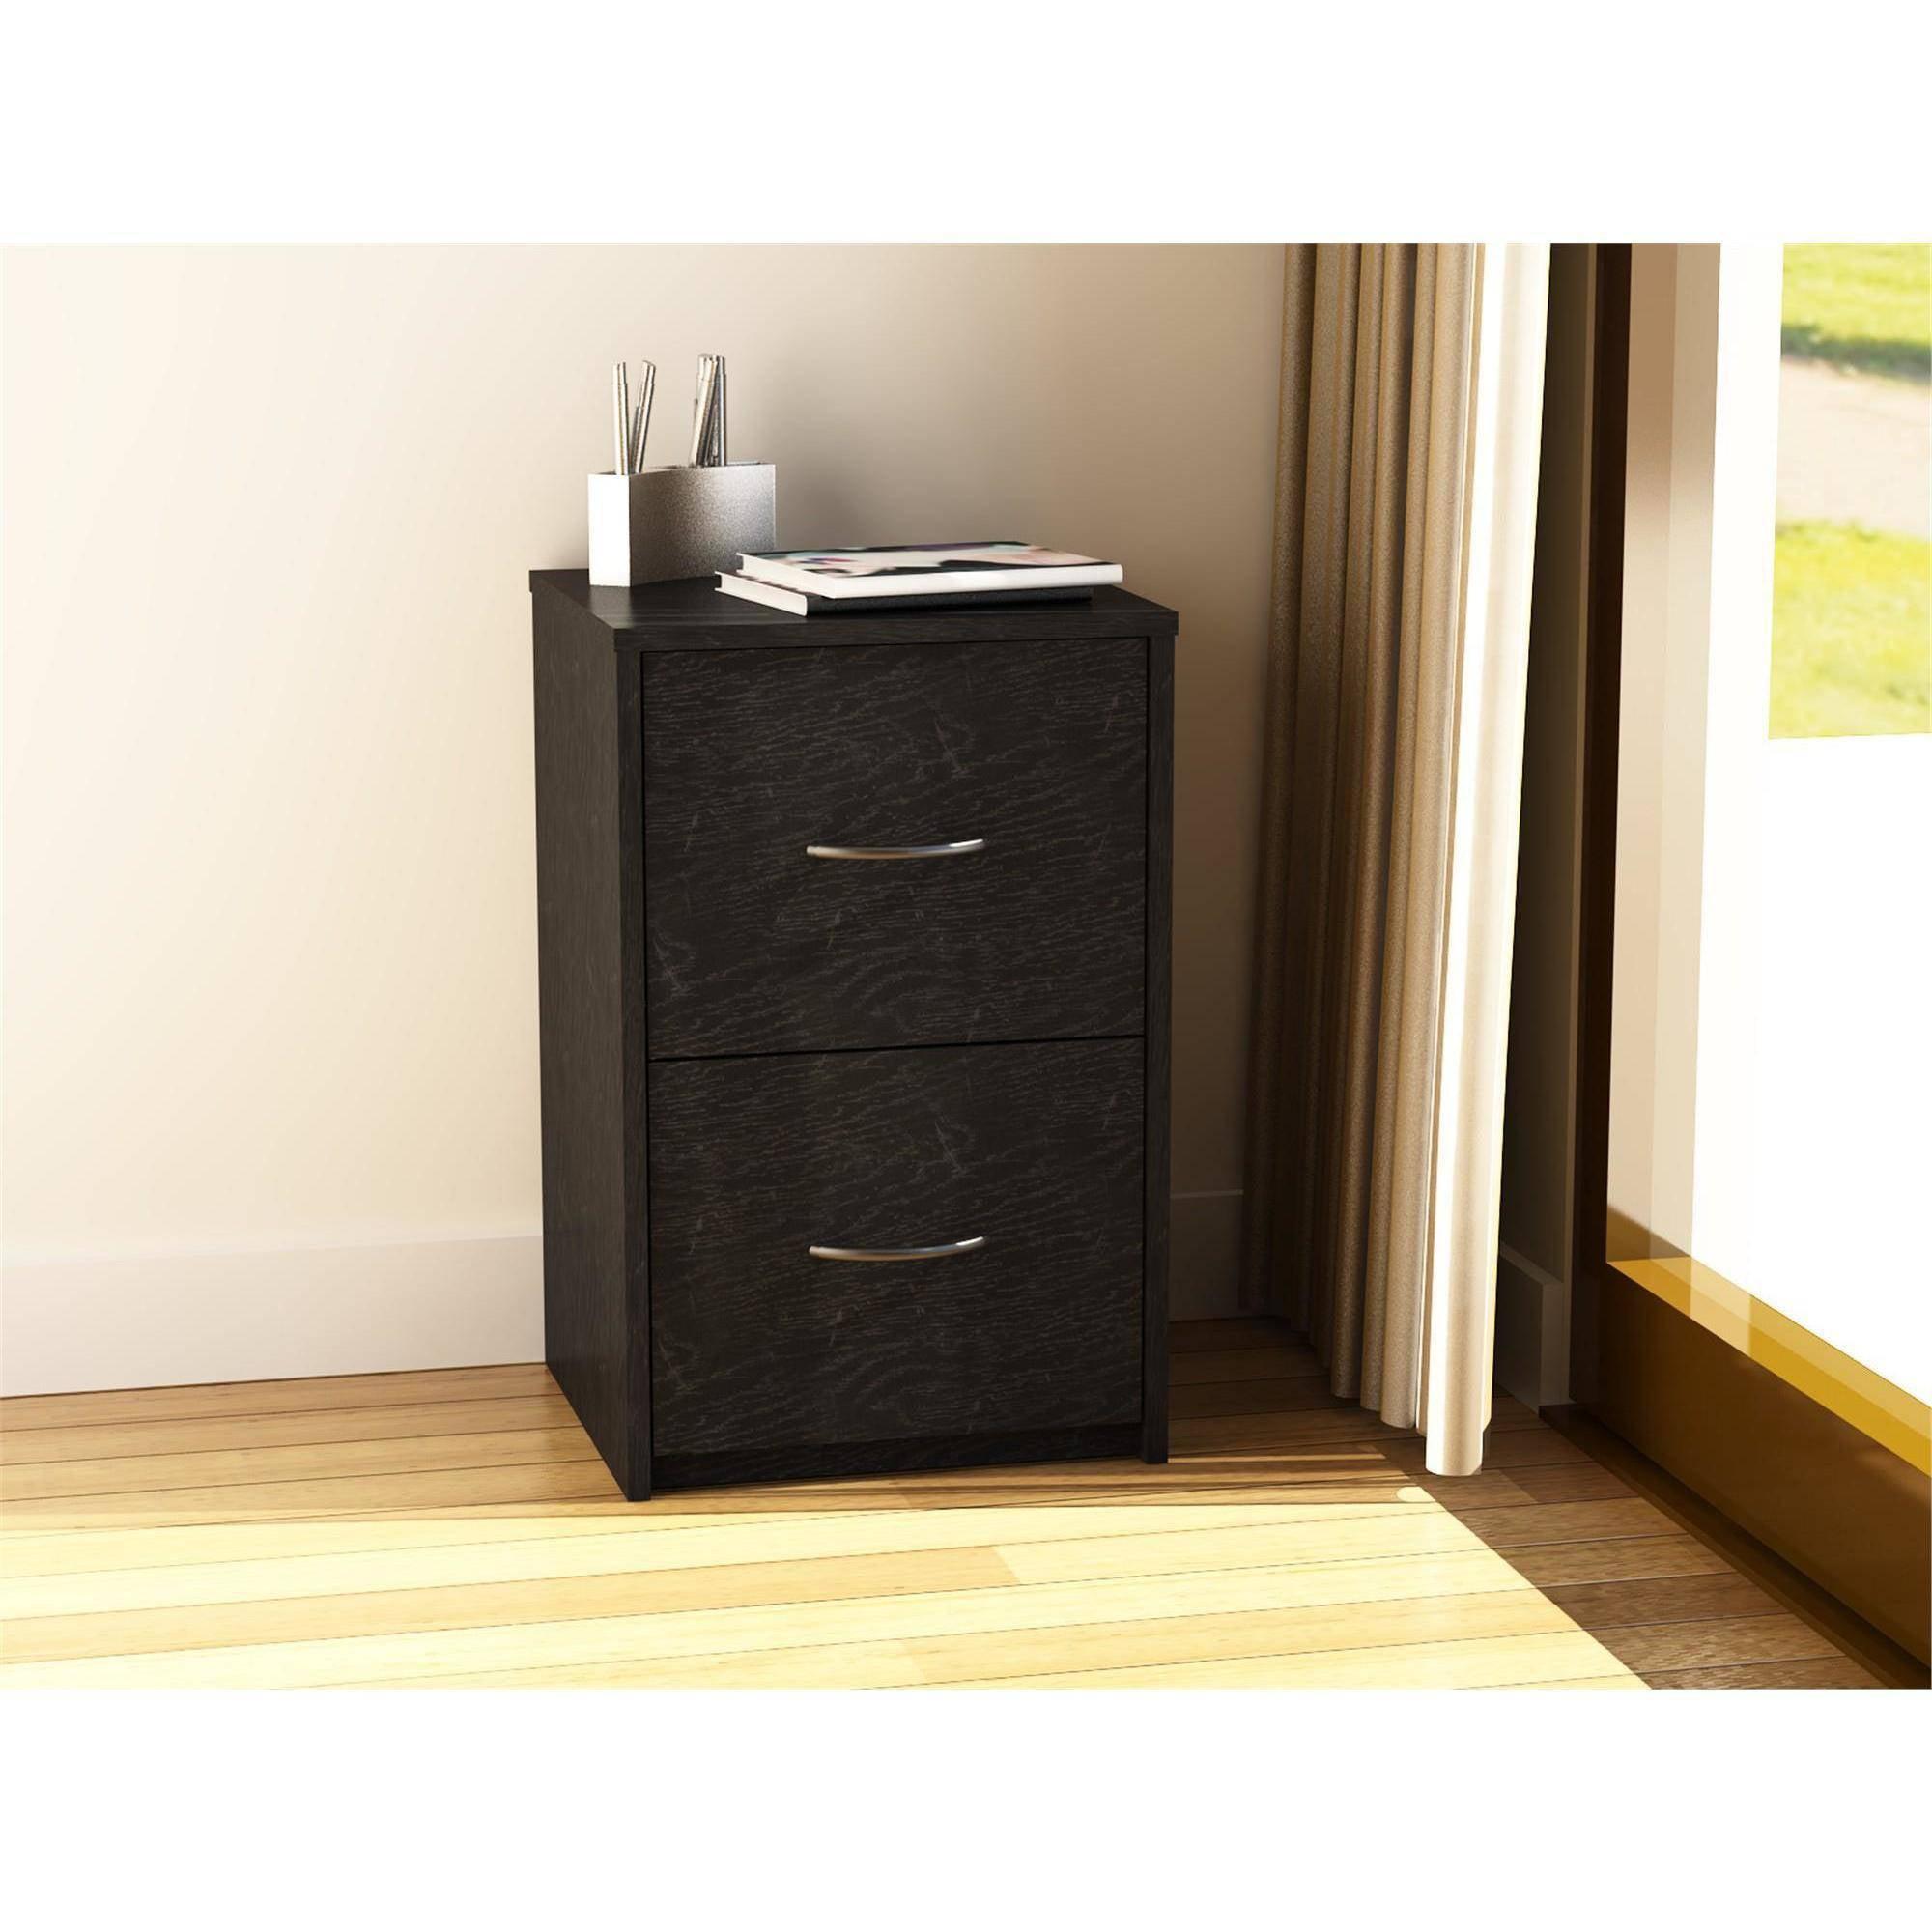 ameriwood home core 2 drawer file cabinet, black - walmart